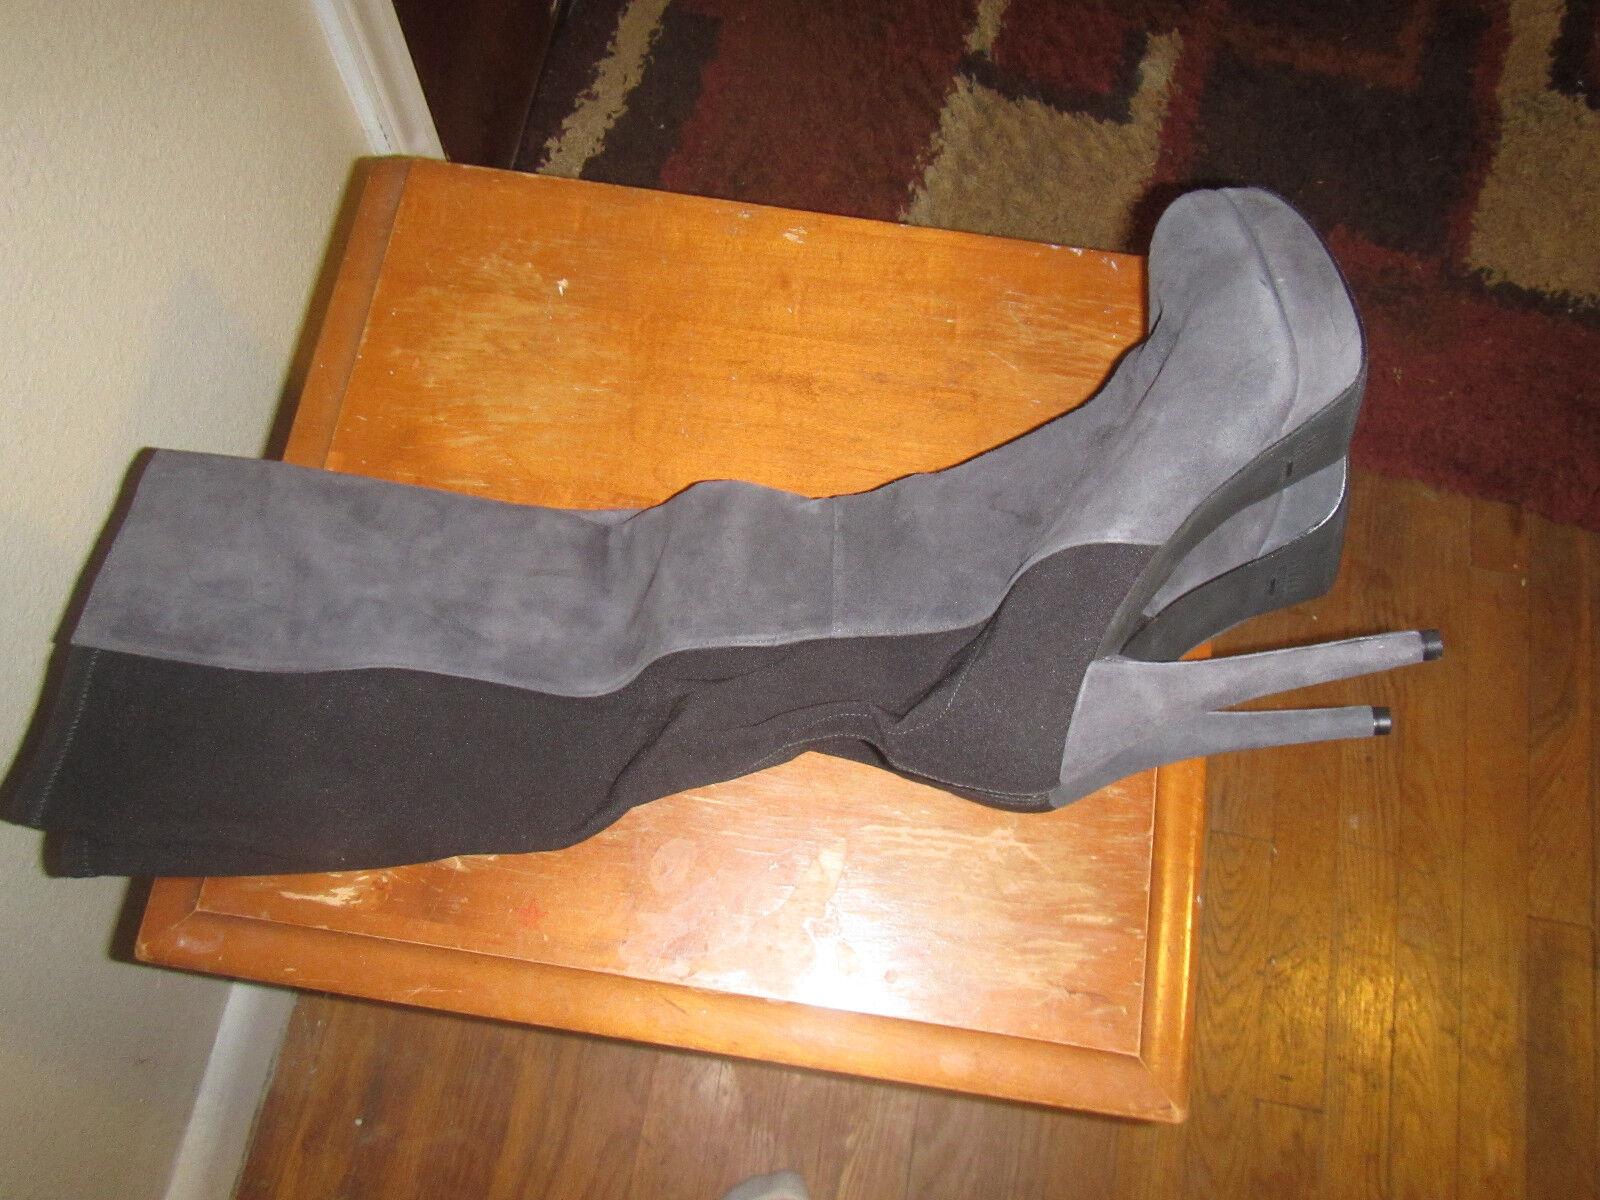 nuovo stile Stuart Weitzman OTK suede nero new stivali stivali stivali 10.5 high heel pull on 50 50 highline  ampia selezione